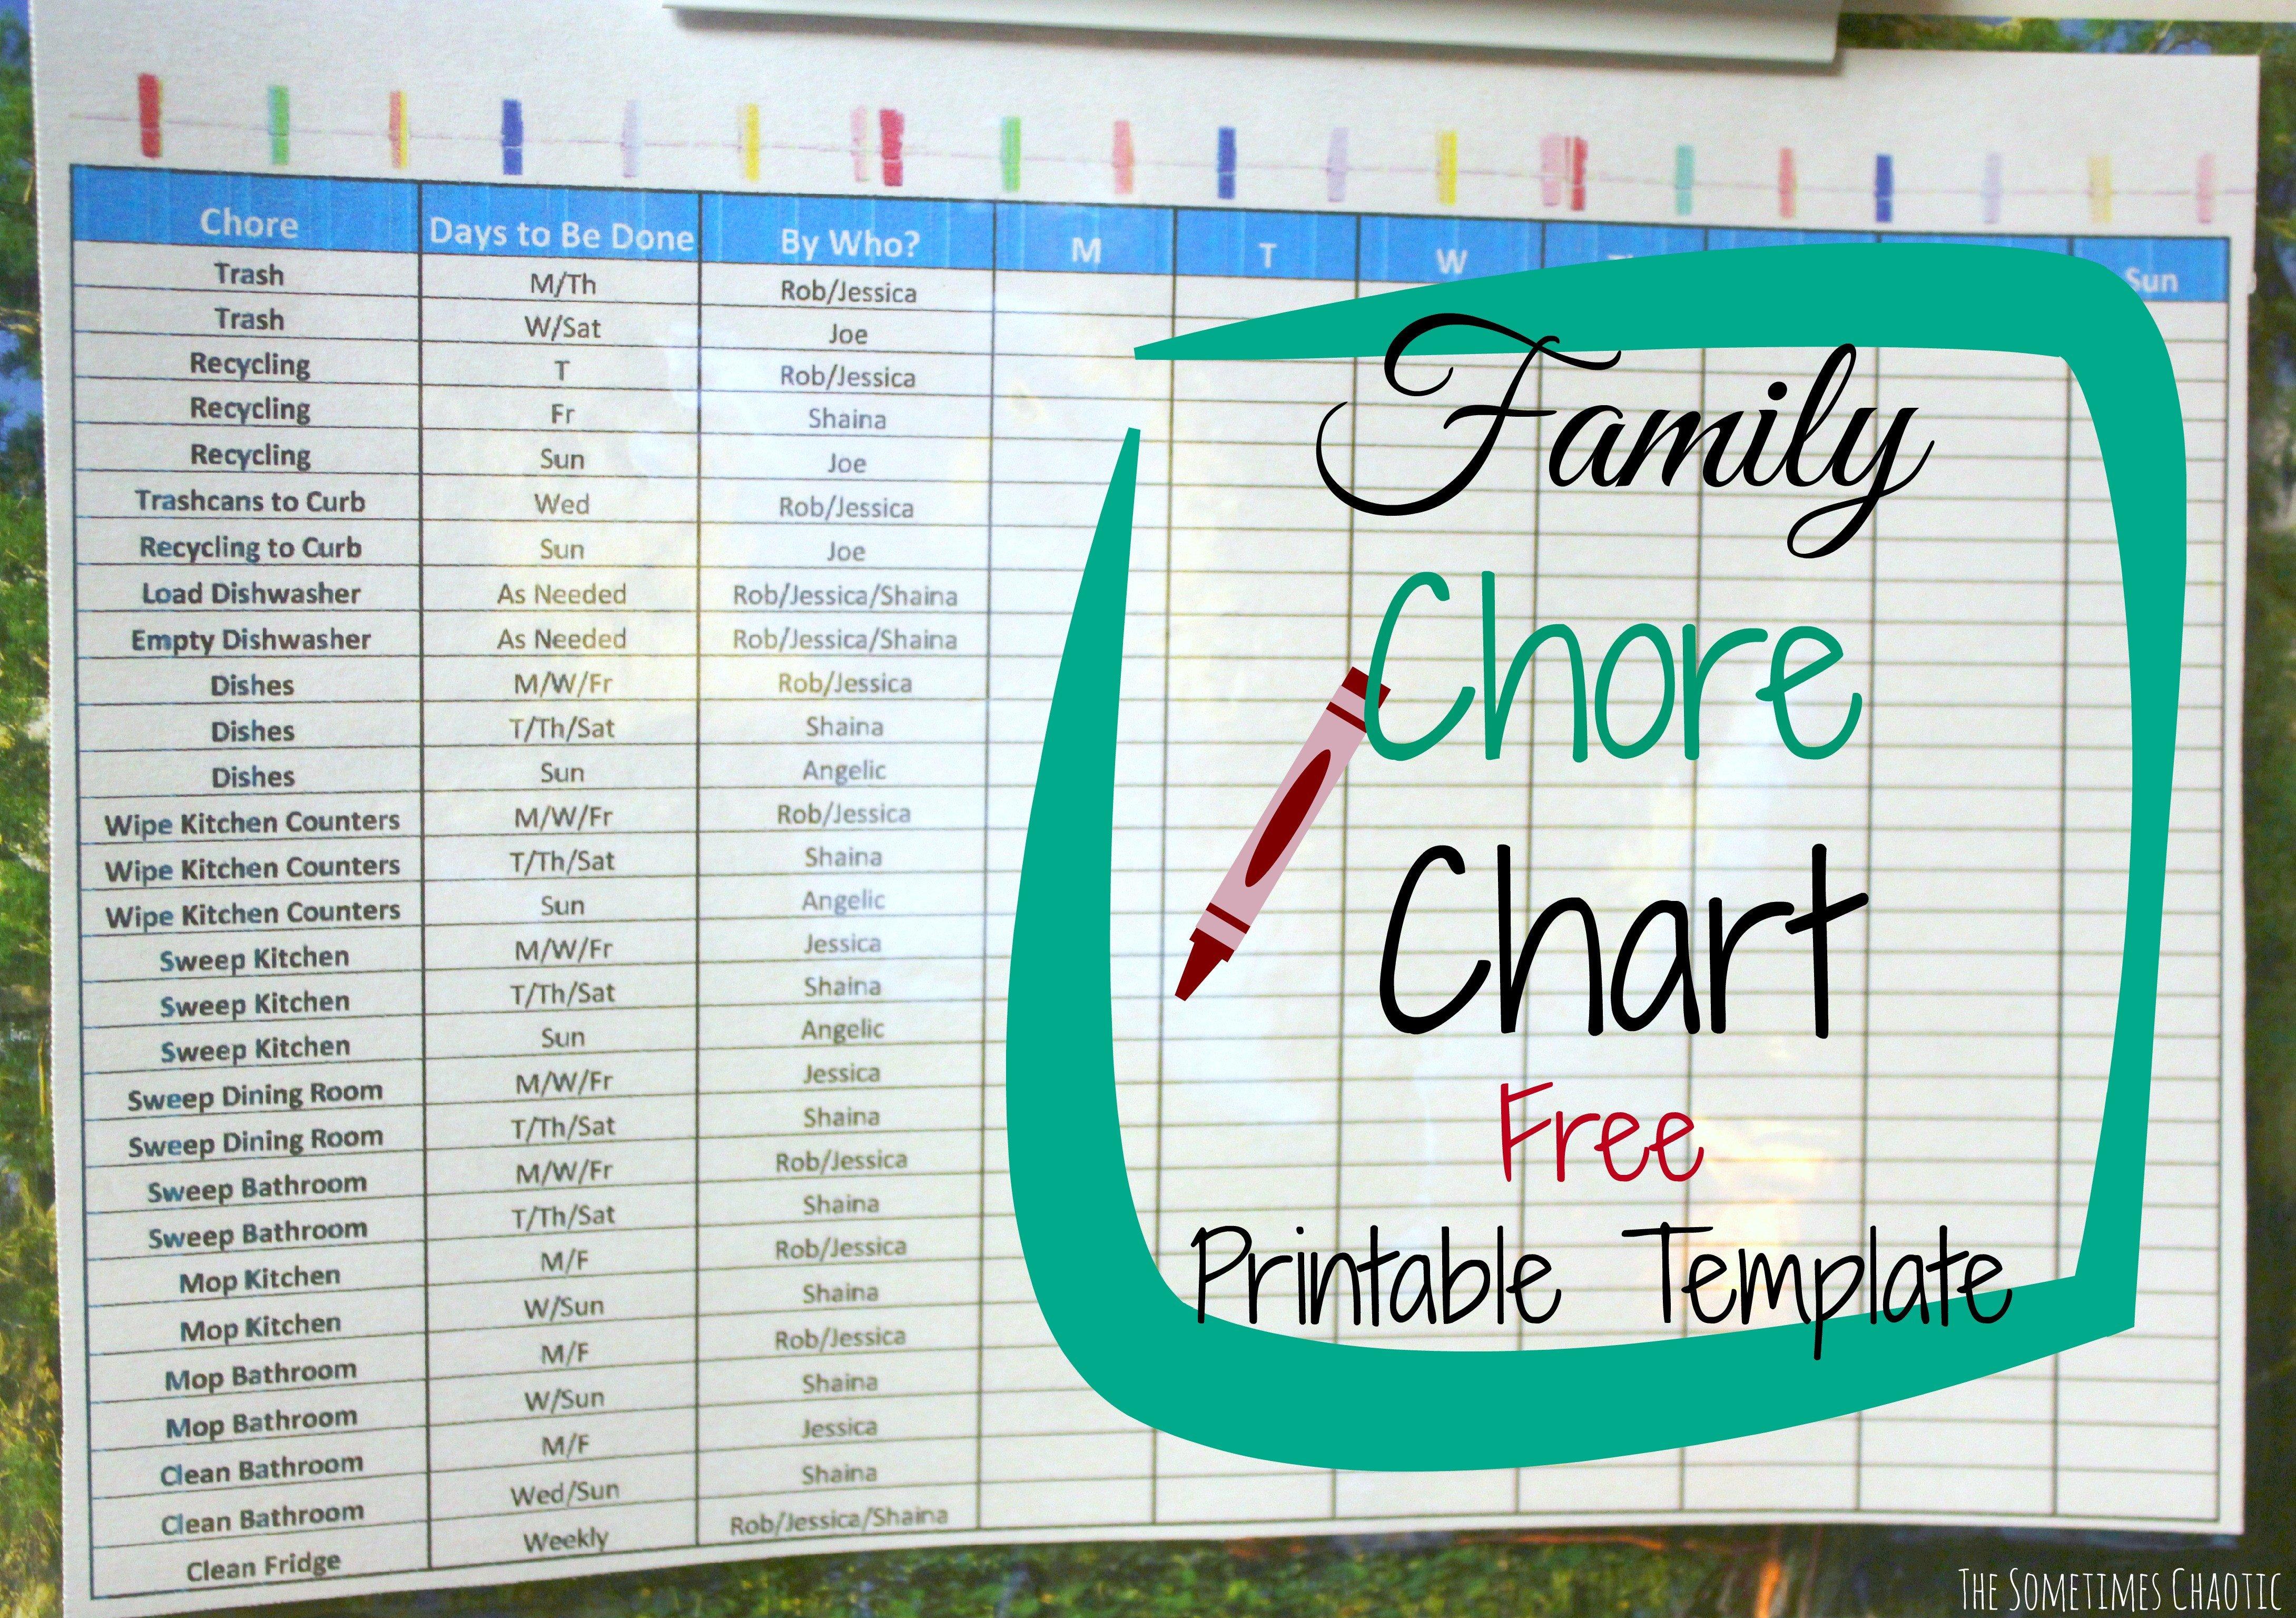 Family Chore Chart Printable Family Chore Chart Printable